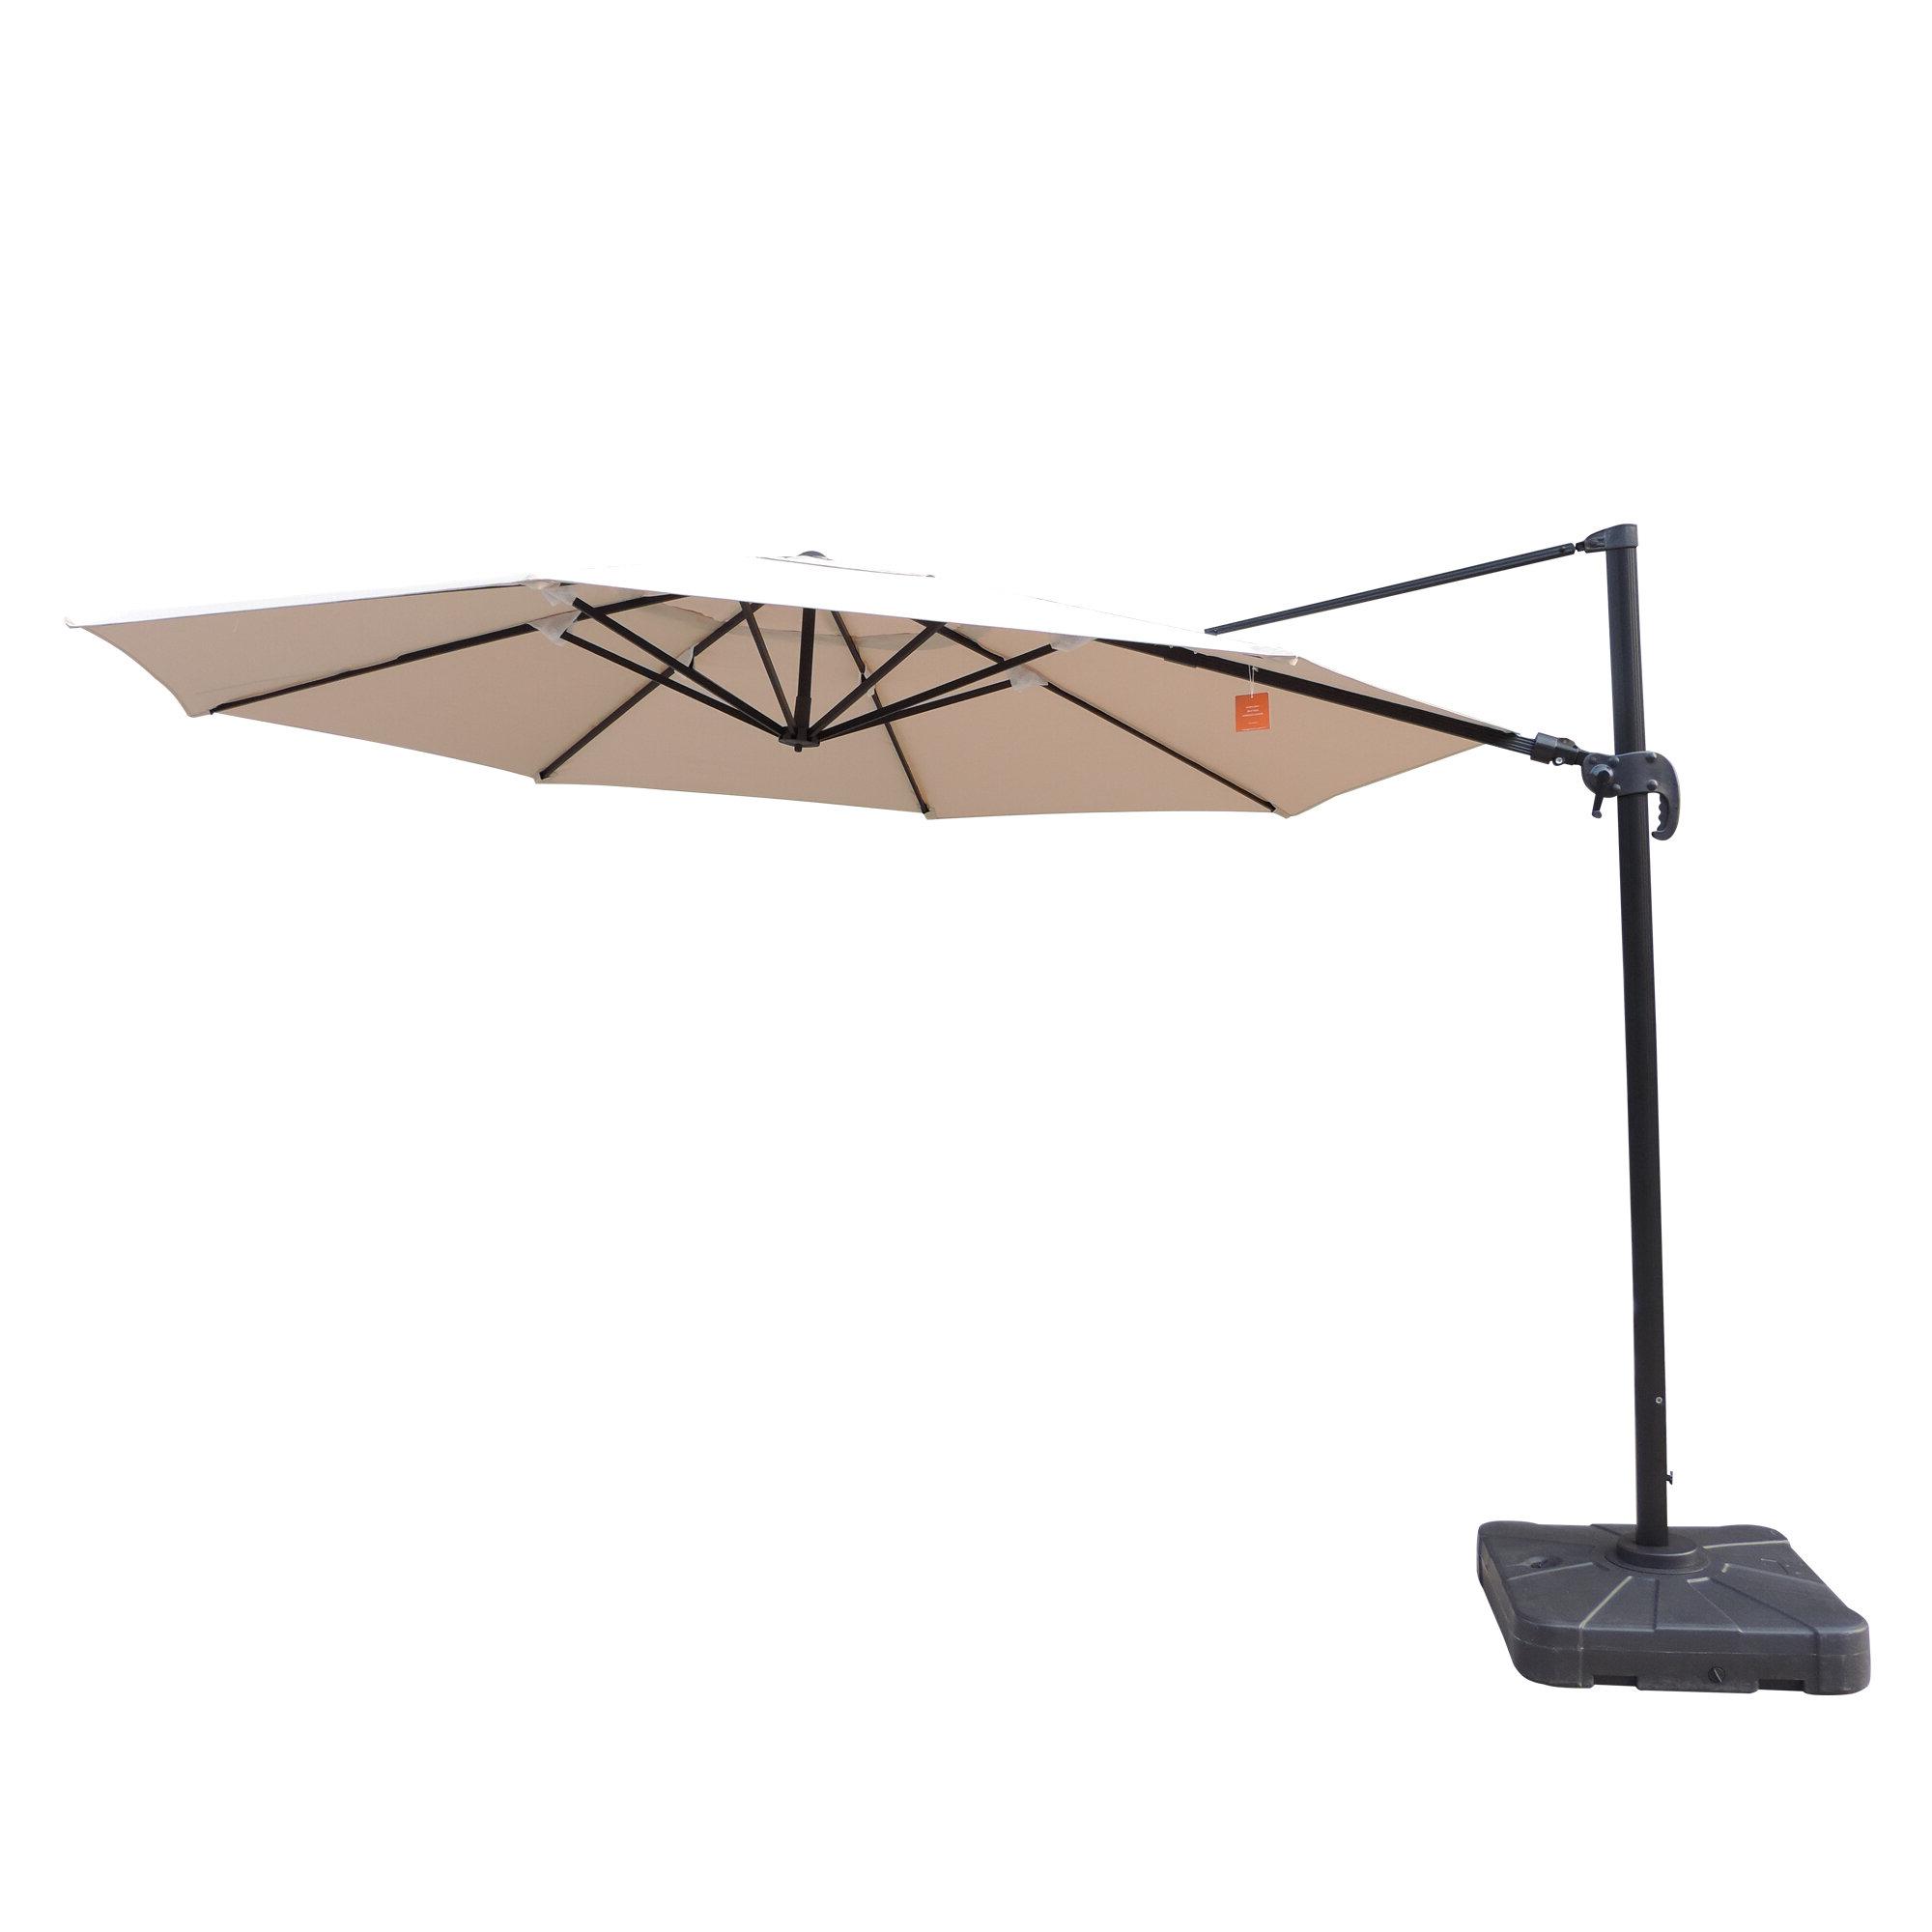 Lennie Cantilever Sunbrella Umbrellas In Popular Canora Grey Lennie 13' Cantilever Sunbrella Umbrella (View 8 of 20)